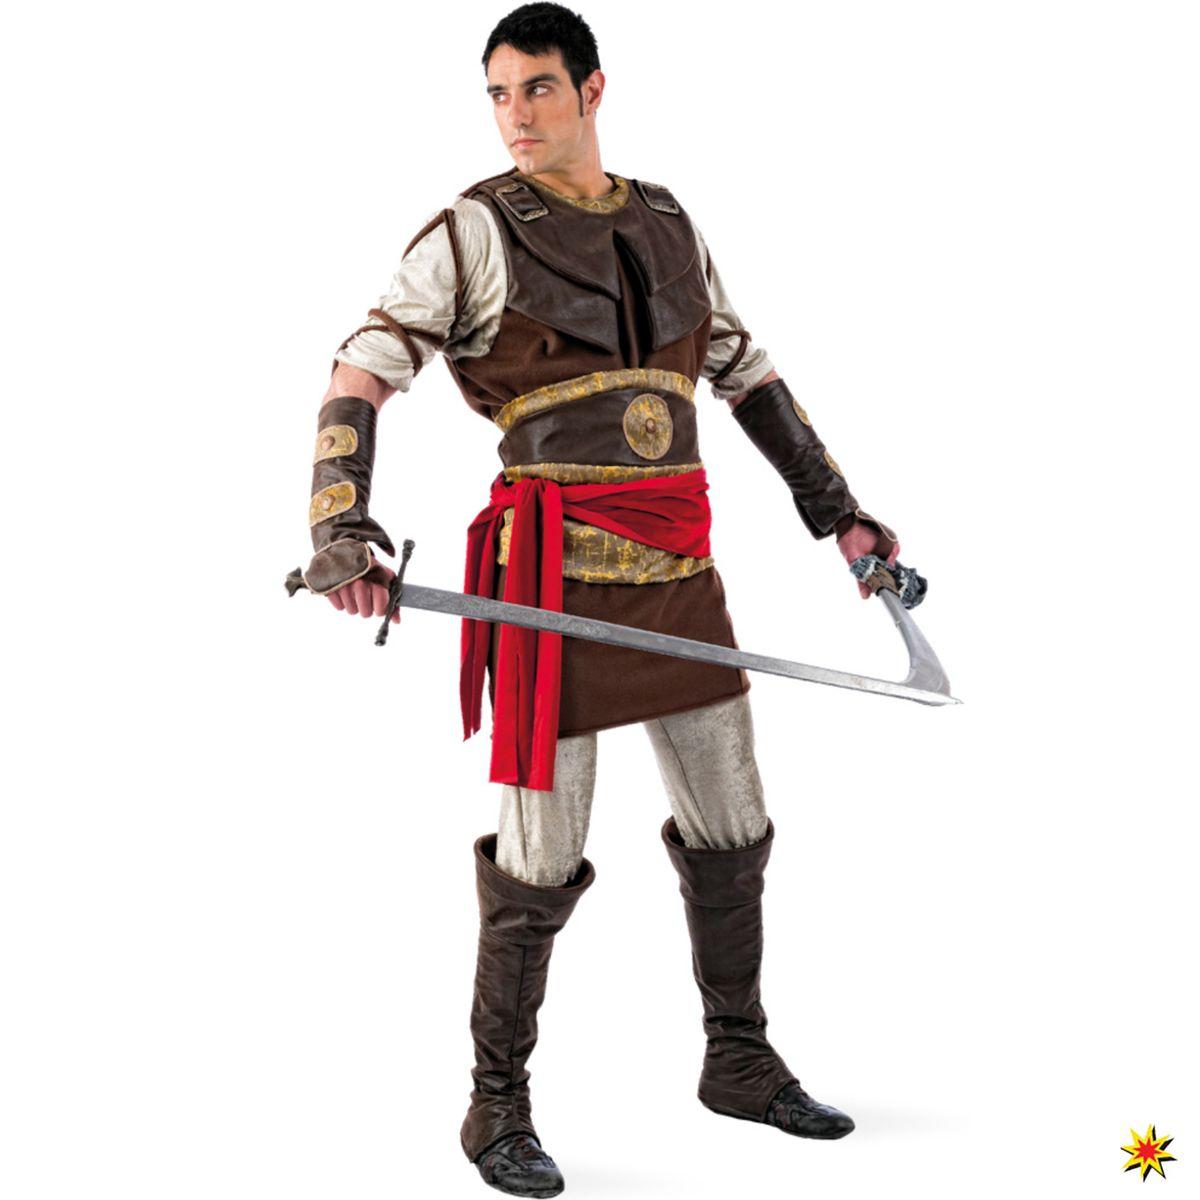 Kostüm Prince of Persia Deluxe Legionär Gladiator Tribun Krieger Filmstar Orient Fasching Karneval Mottoparty